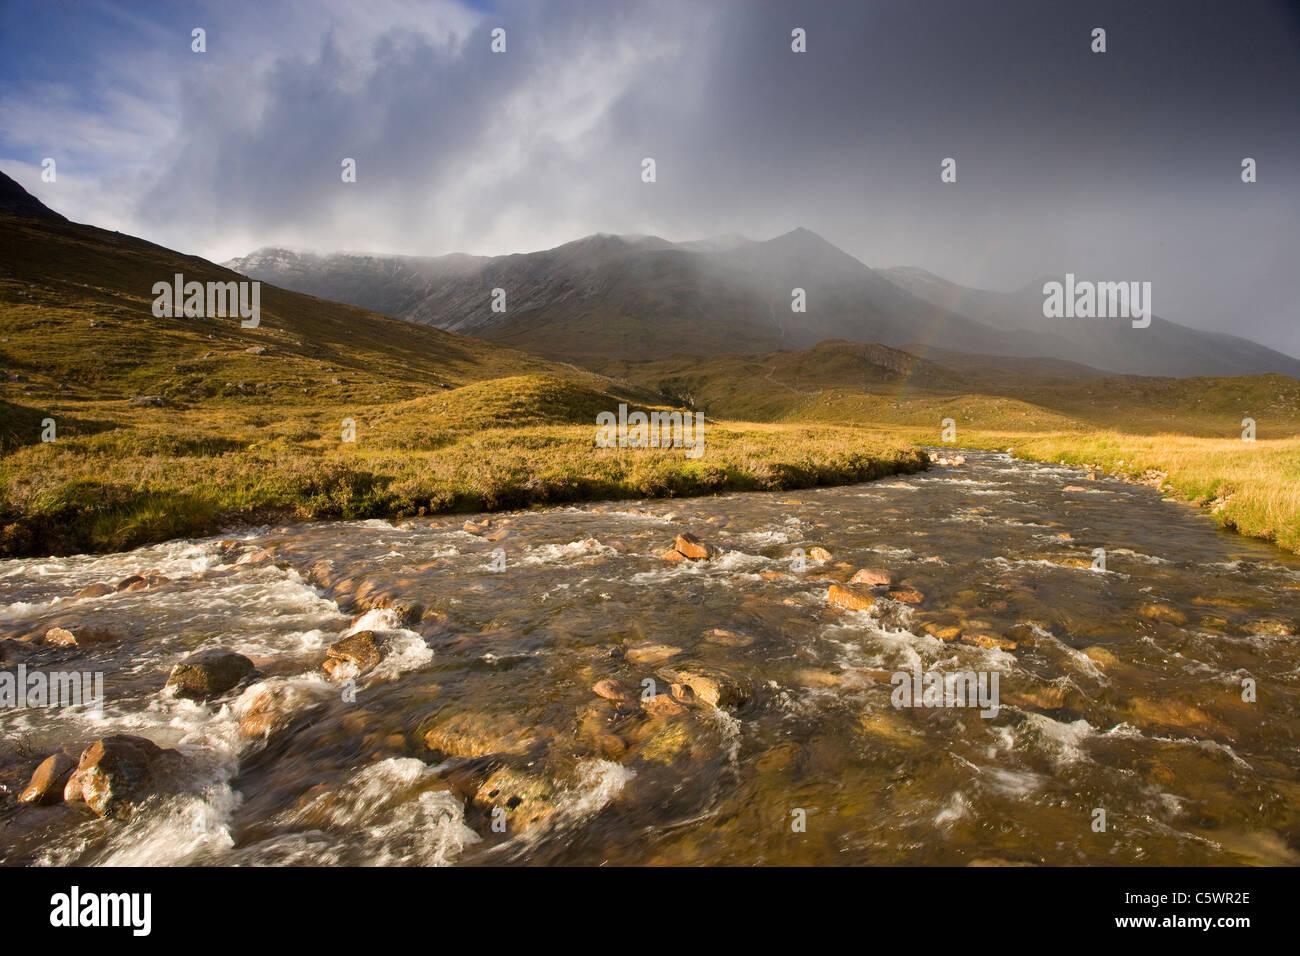 River Torridon, Glen Torridon with Beinn Eighe range beyond. Torridon, Wester Ross, Scotland, Great Britain. - Stock Image